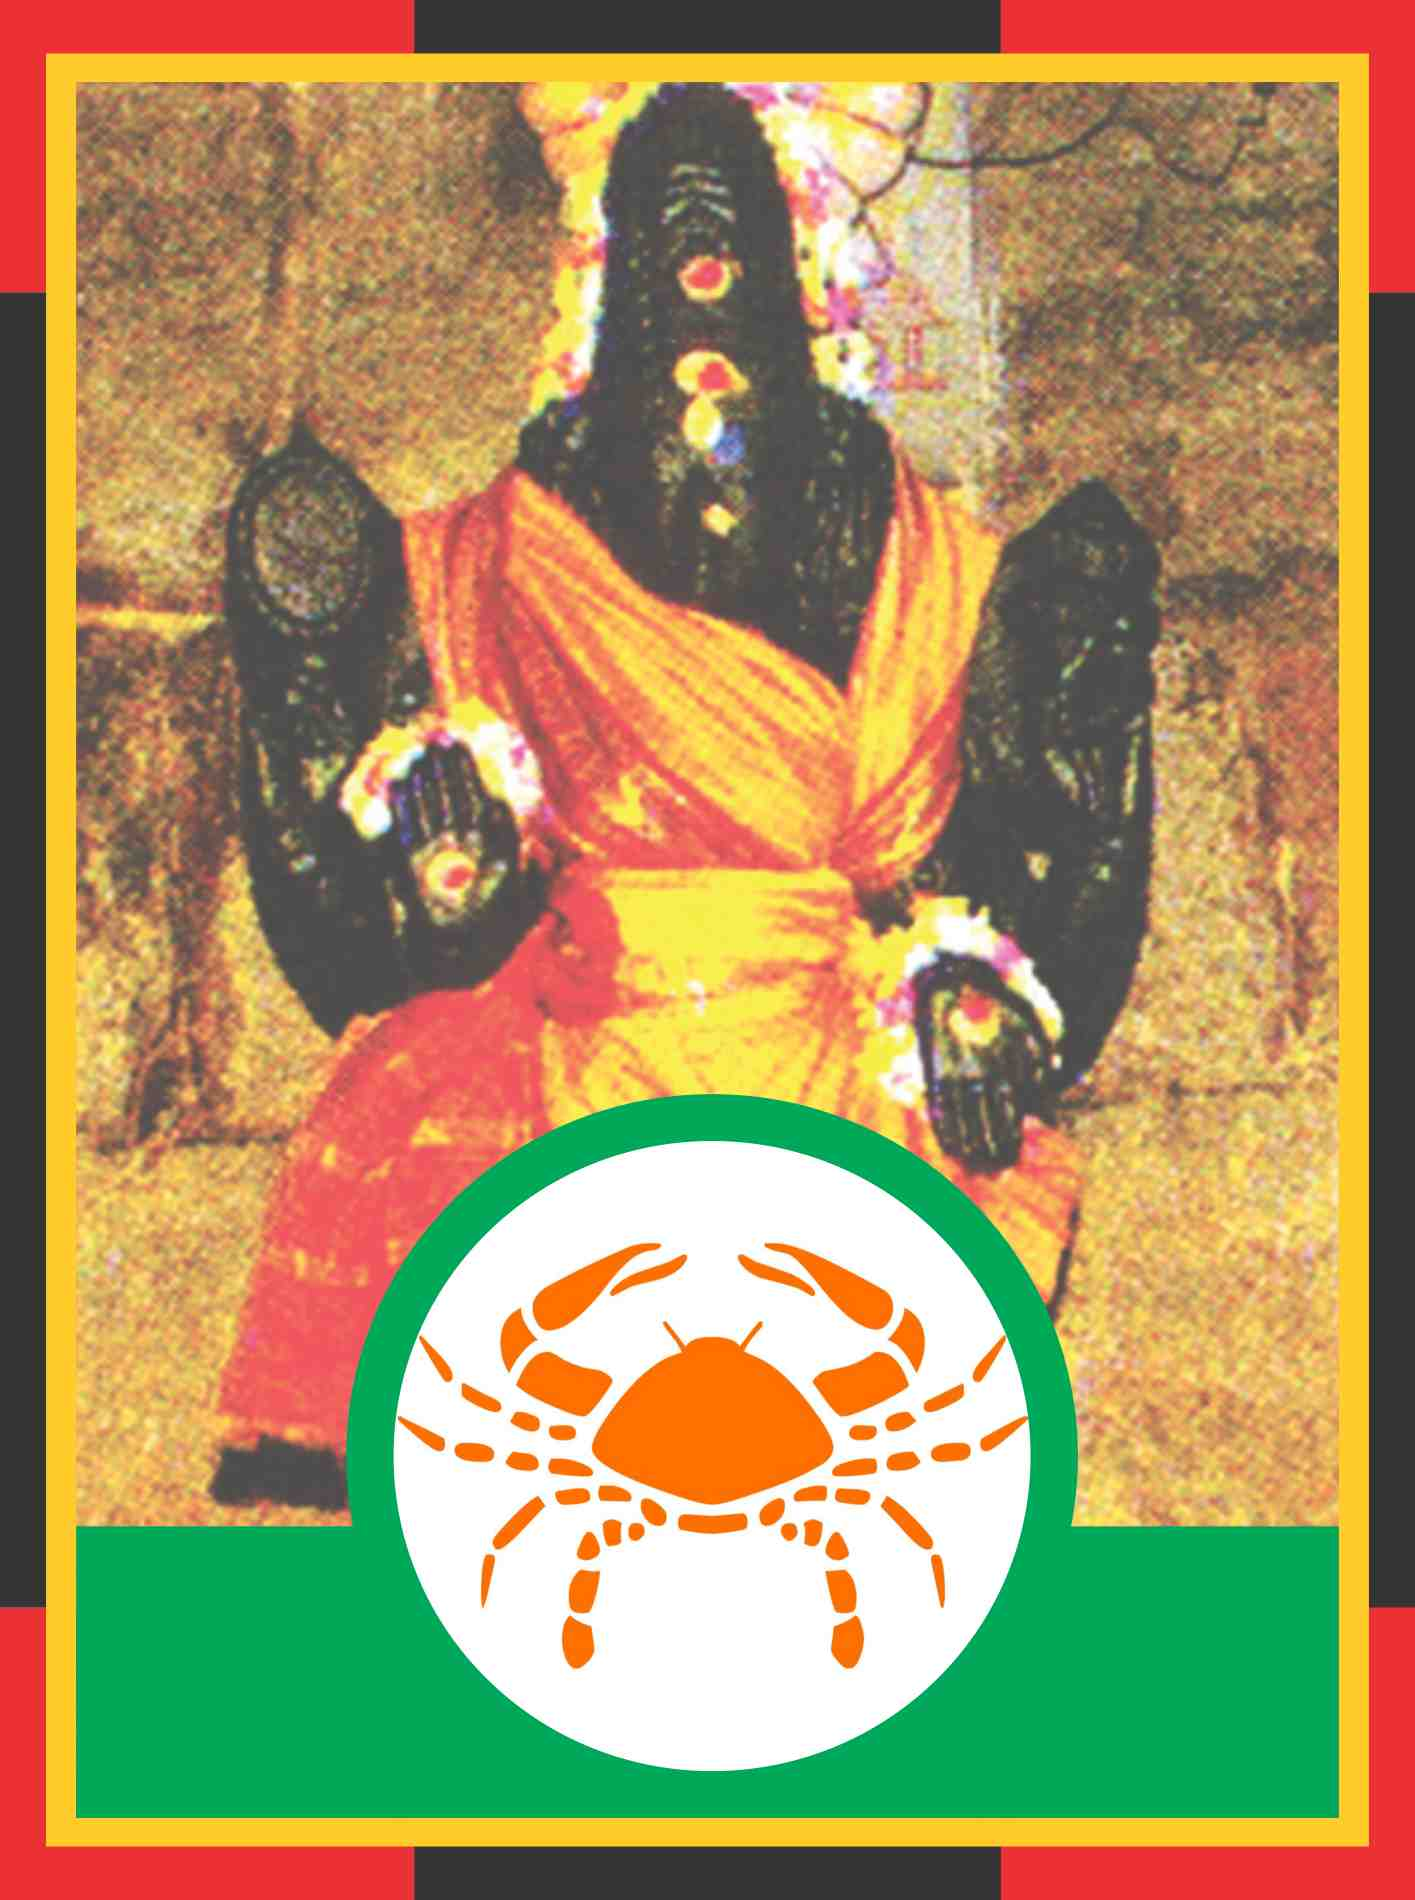 Kamarasavalli - Karkodeswarar Temple Spl Parihara Puja for Kataka Rasi